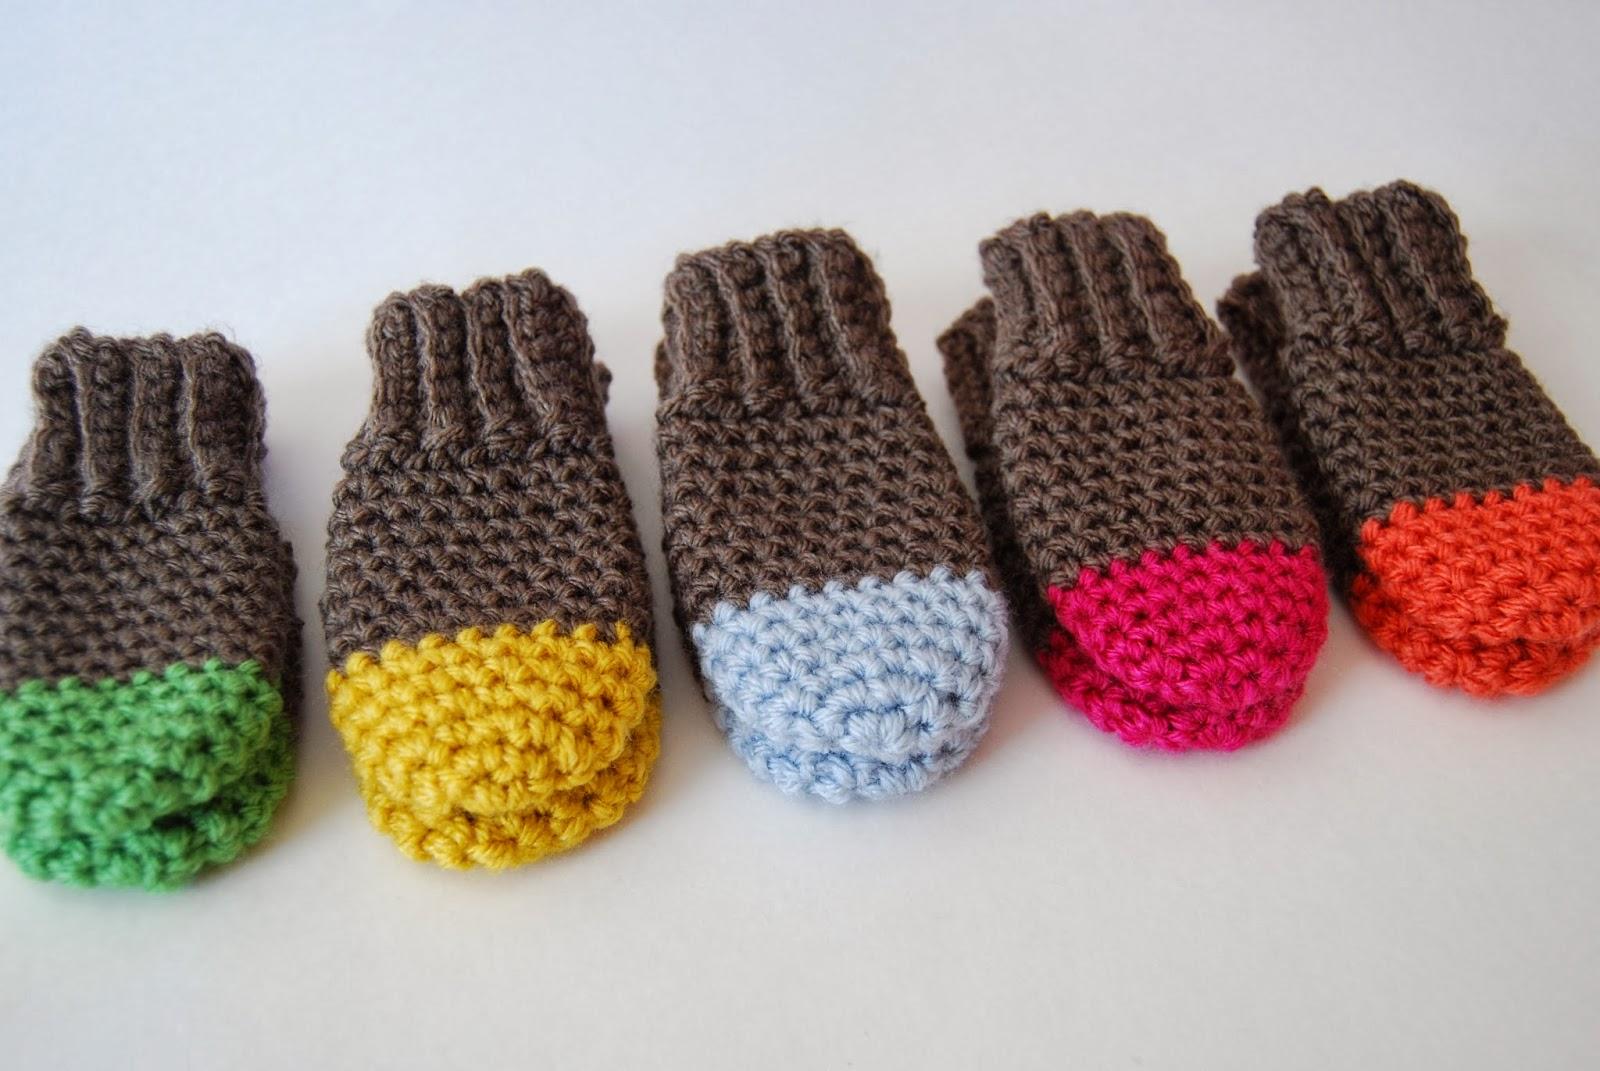 crochet baby mittens free crochet pattern two tone baby mittens DPPYOLR